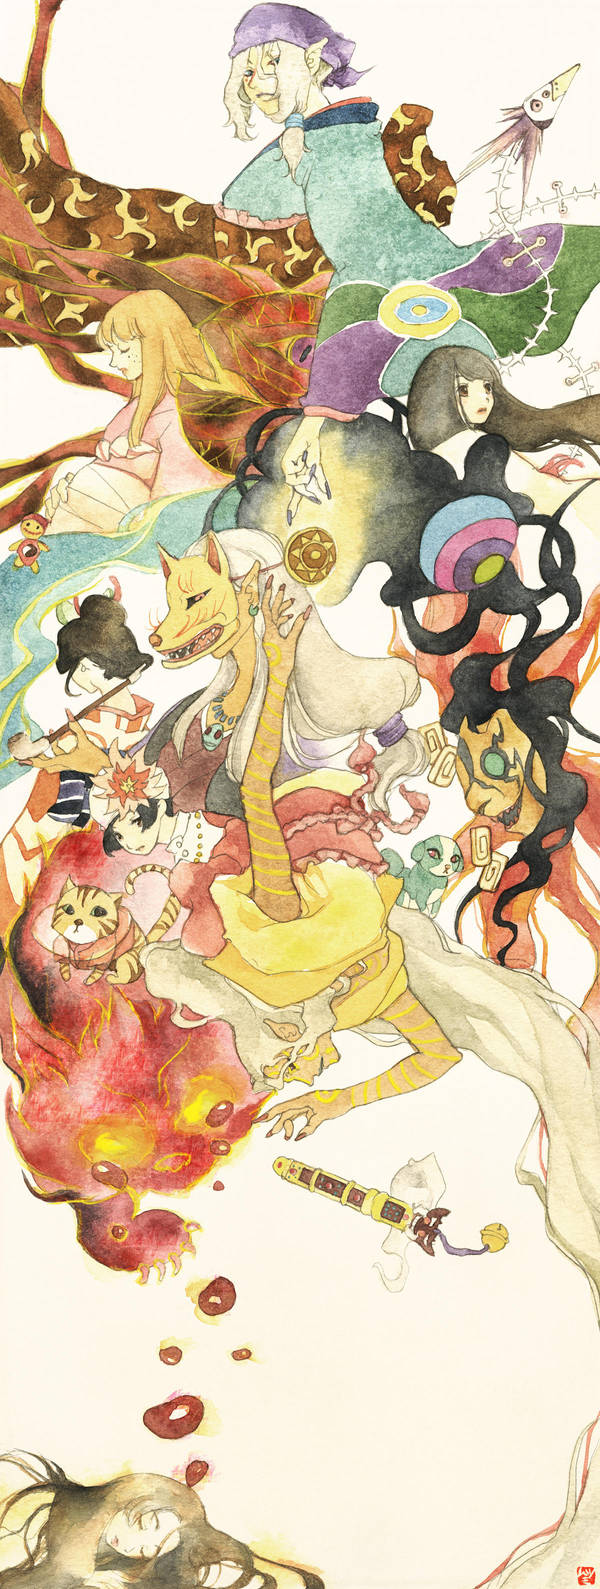 The world of Mononoke by muttiy